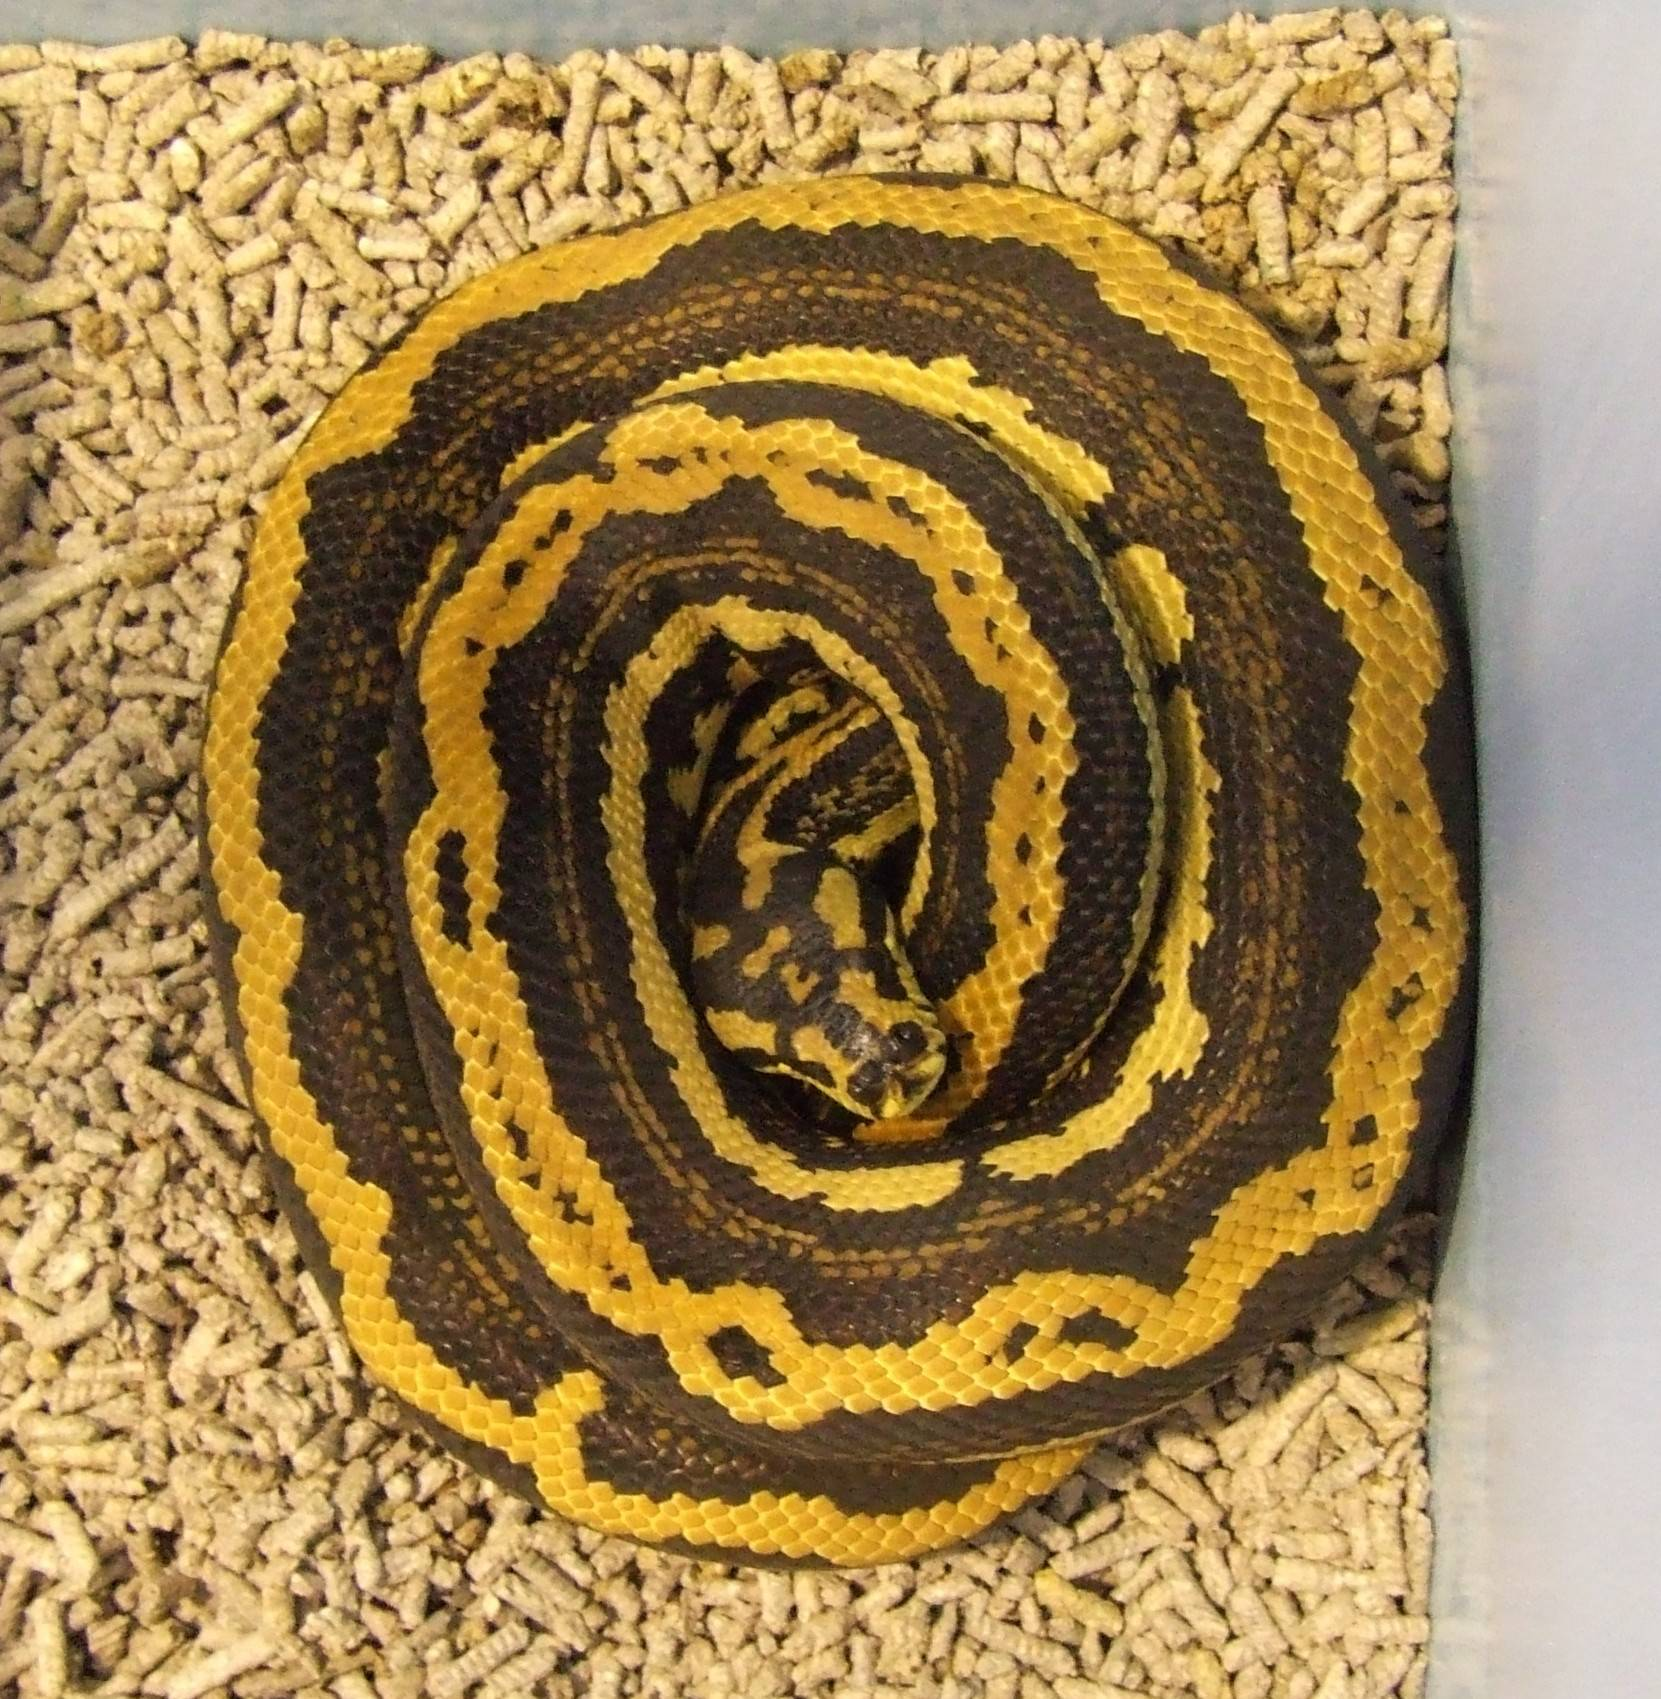 Jungle Carpet - Palmerston Striped male